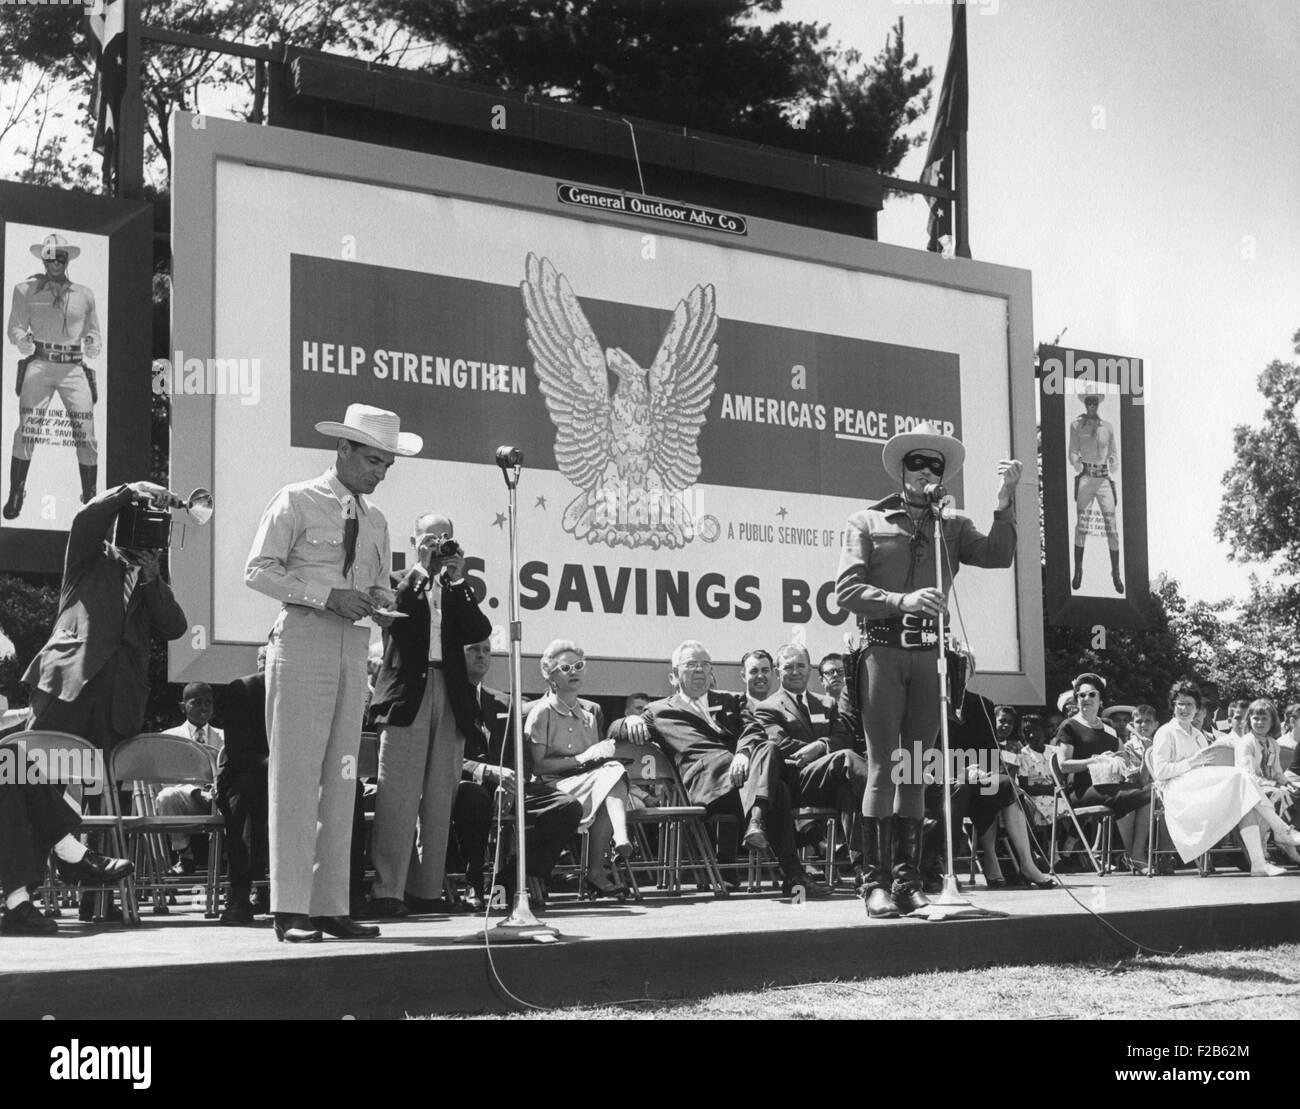 Actor Clayton Moore in his Lone Ranger character promotes U.S. Savings Bonds. Washington, D.C. June 17, 1958. - - Stock Image